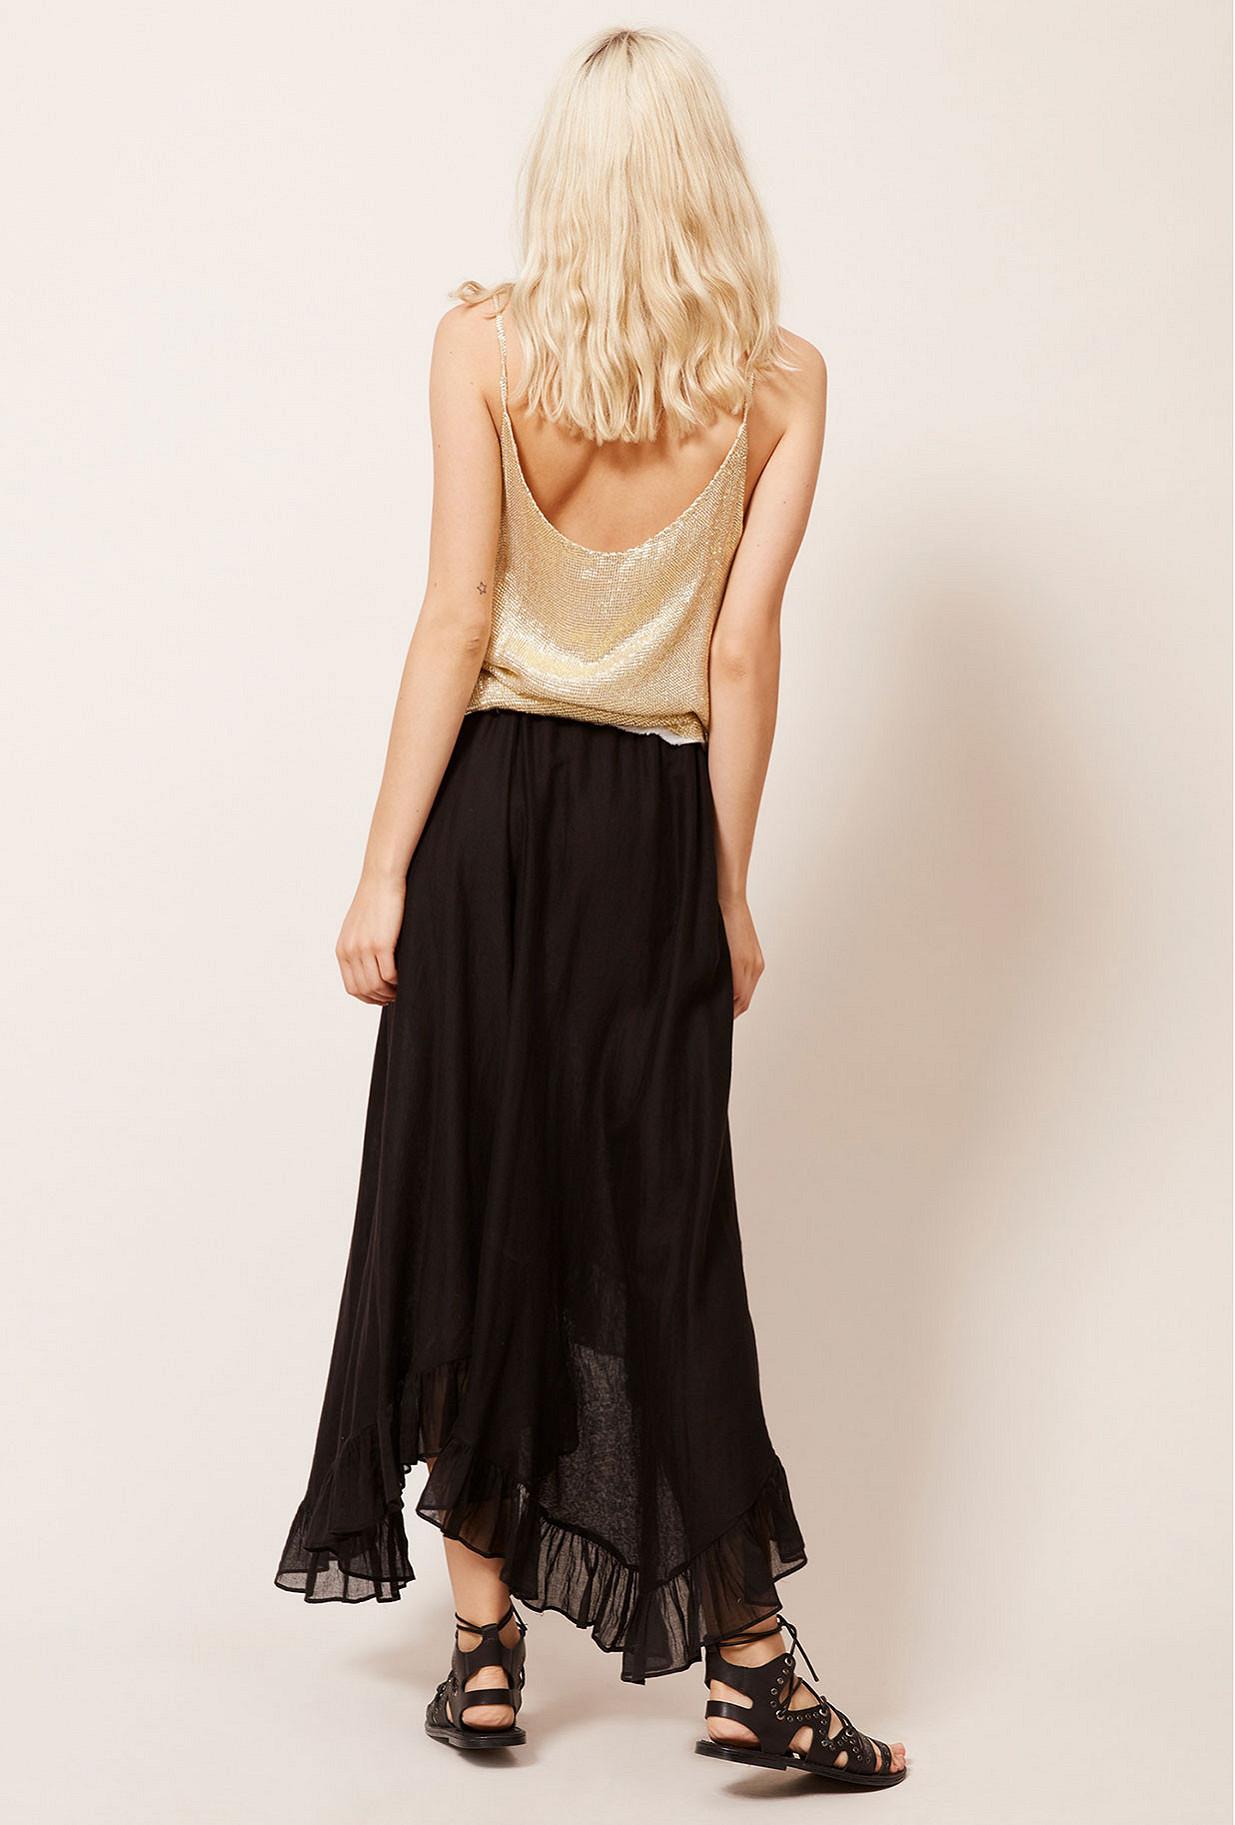 Paris clothes store Skirt  Otello french designer fashion Paris